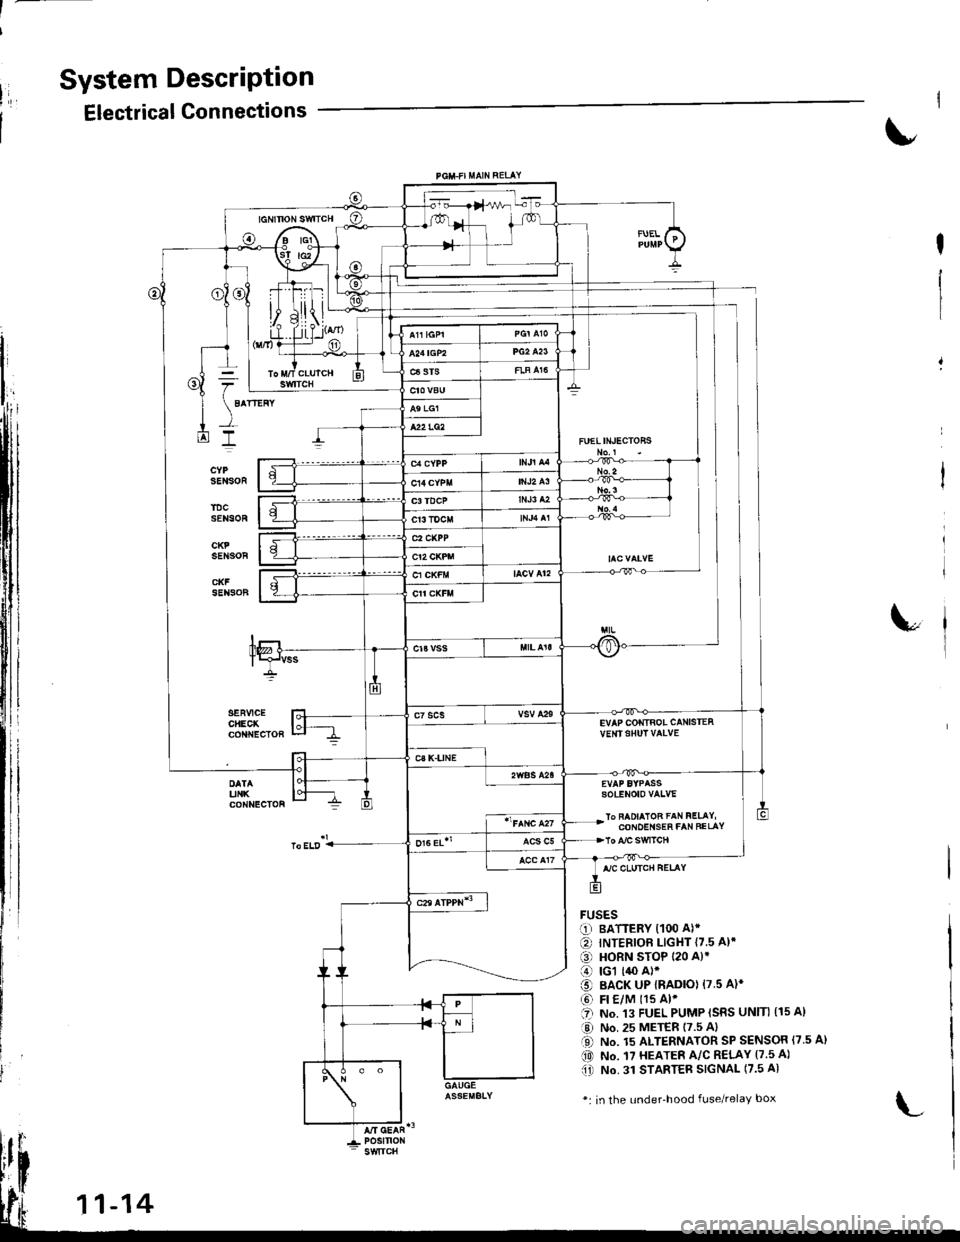 Cm400c Wiring Diagram Schematic Diagrams Electrical Of Honda Cm400a Enthusiast U2022 A Non Computer 700r4 Source 1981